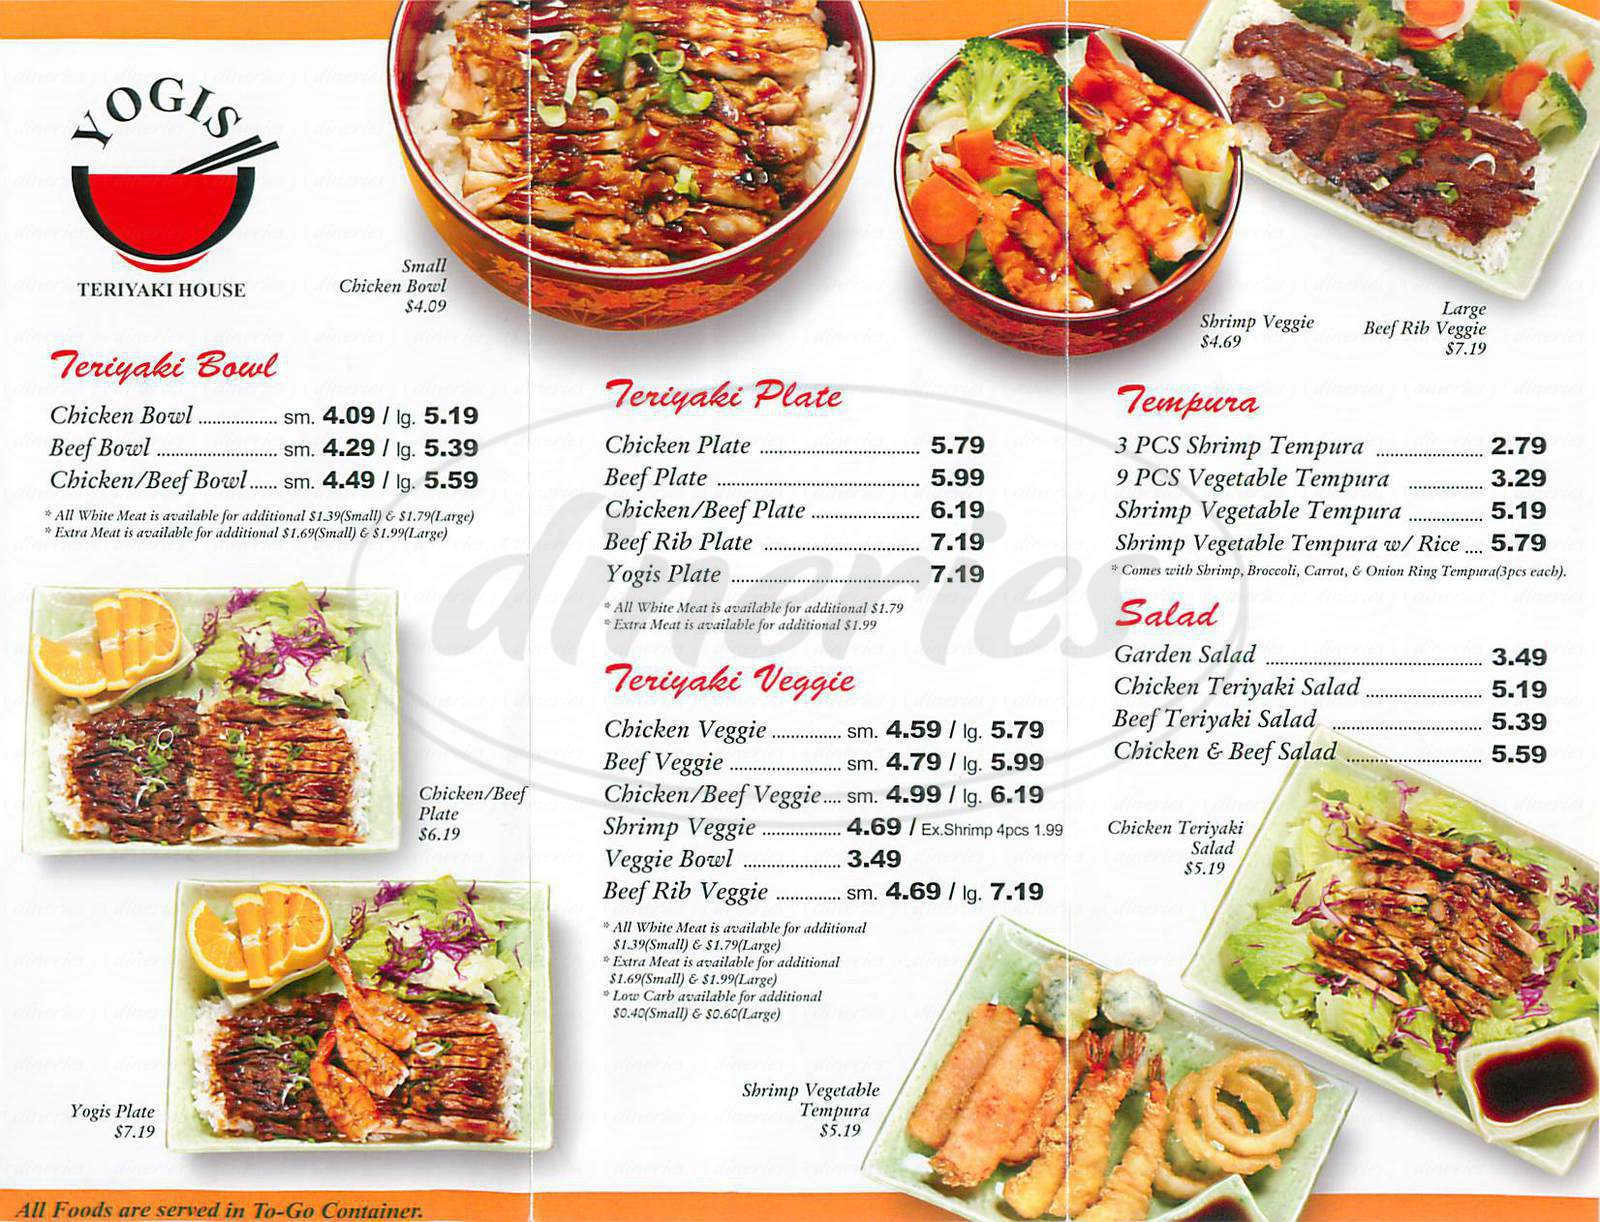 menu for Yogis Teriyaki